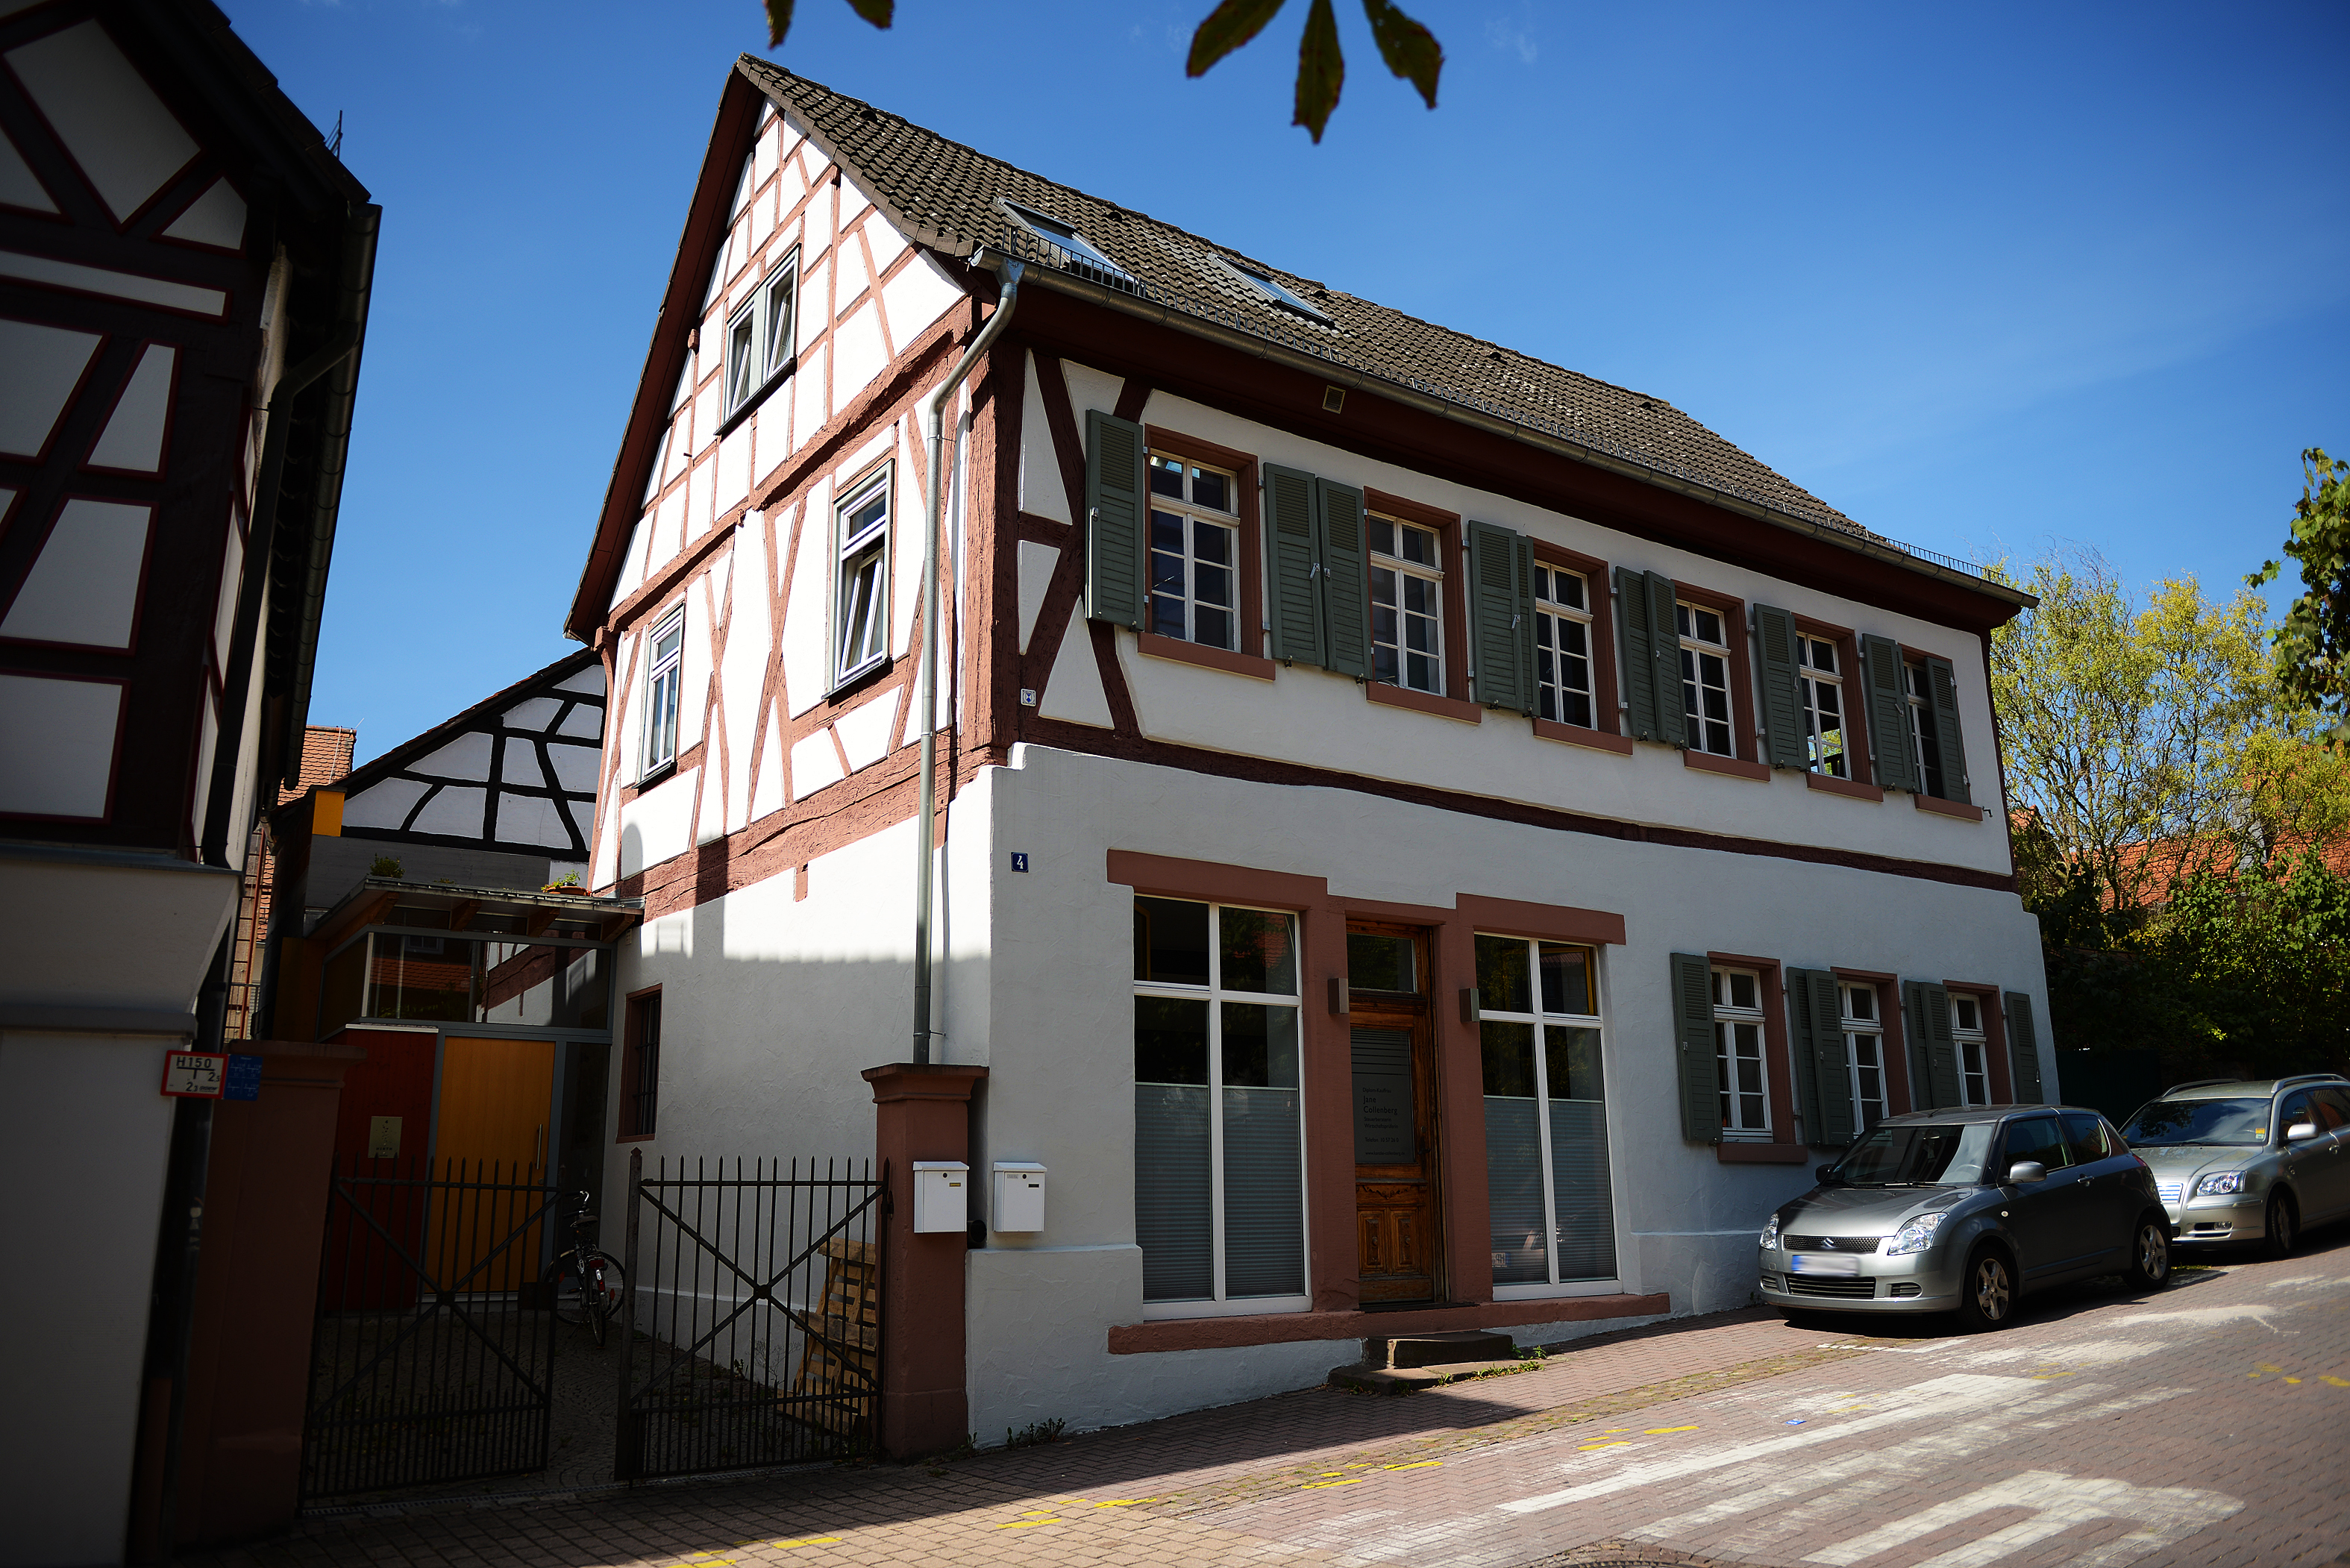 File 64625 Bensheim Auerbach Weidgasse Wikimedia